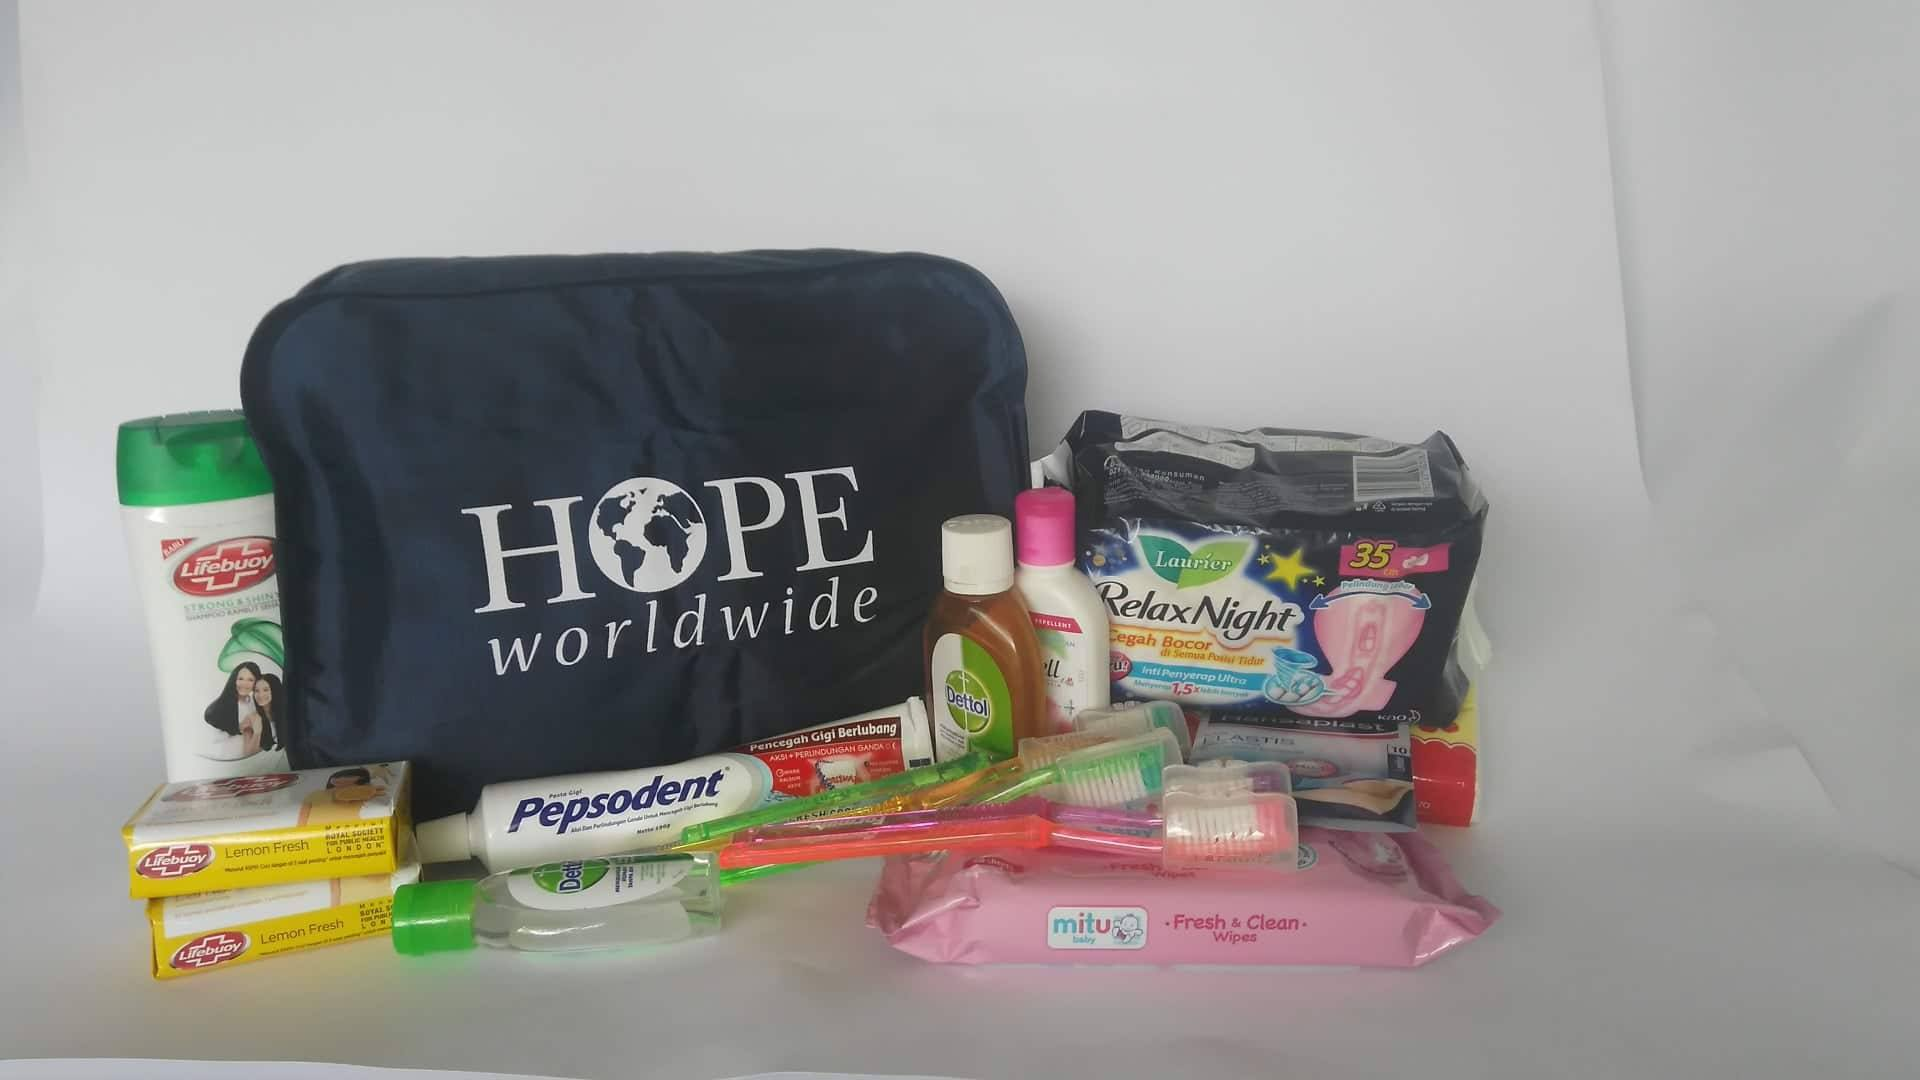 Hygiene Kit (for a woman)Shampoo  Soft Soap  Women's razor  Shave Cream  Toothbrush  Toothpaste  Deodorant  Mouthwash  Brush  Feminine Pads  Towel  Large printed Ziploc bag